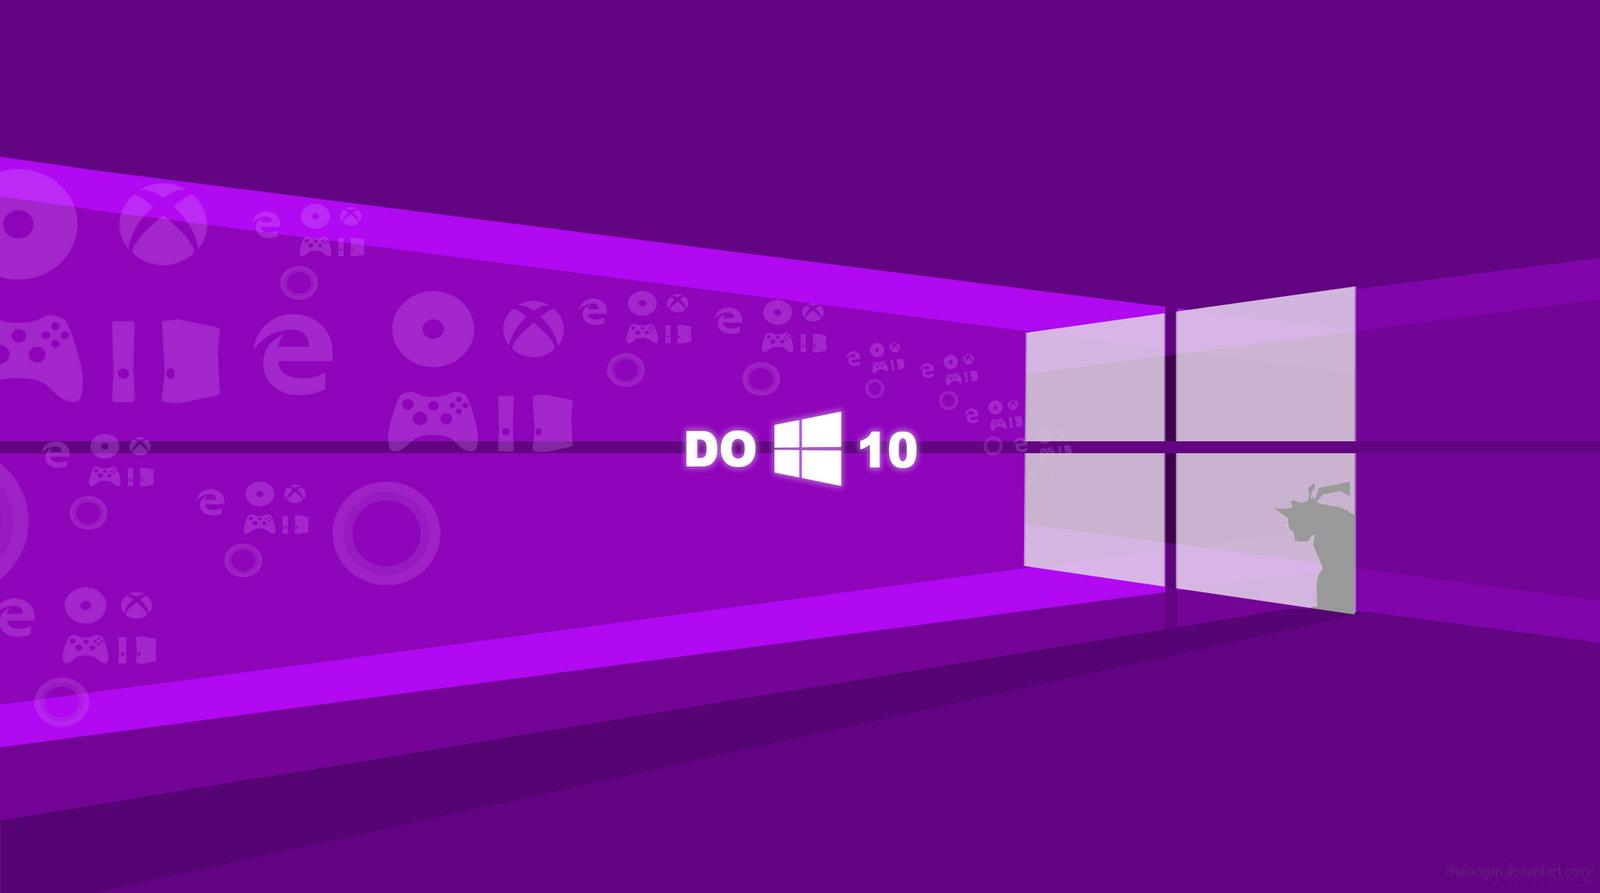 Flat Windows 10 Wallpaper Purple By Zhalovejun On DeviantArt